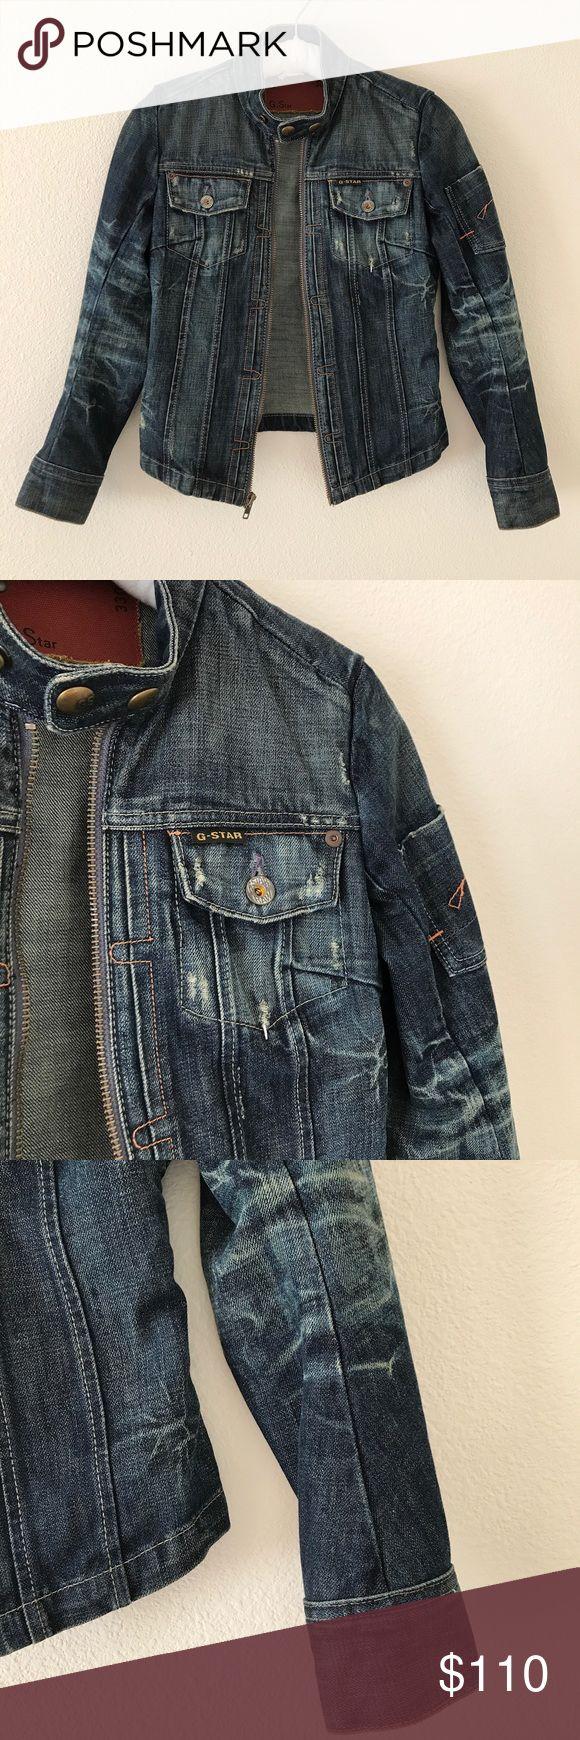 Selling this G.Star Raw Denim Jacket on Poshmark! My username is: 2dehands_0903. #shopmycloset #poshmark #fashion #shopping #style #forsale #G.Star Raw #Jackets & Blazers